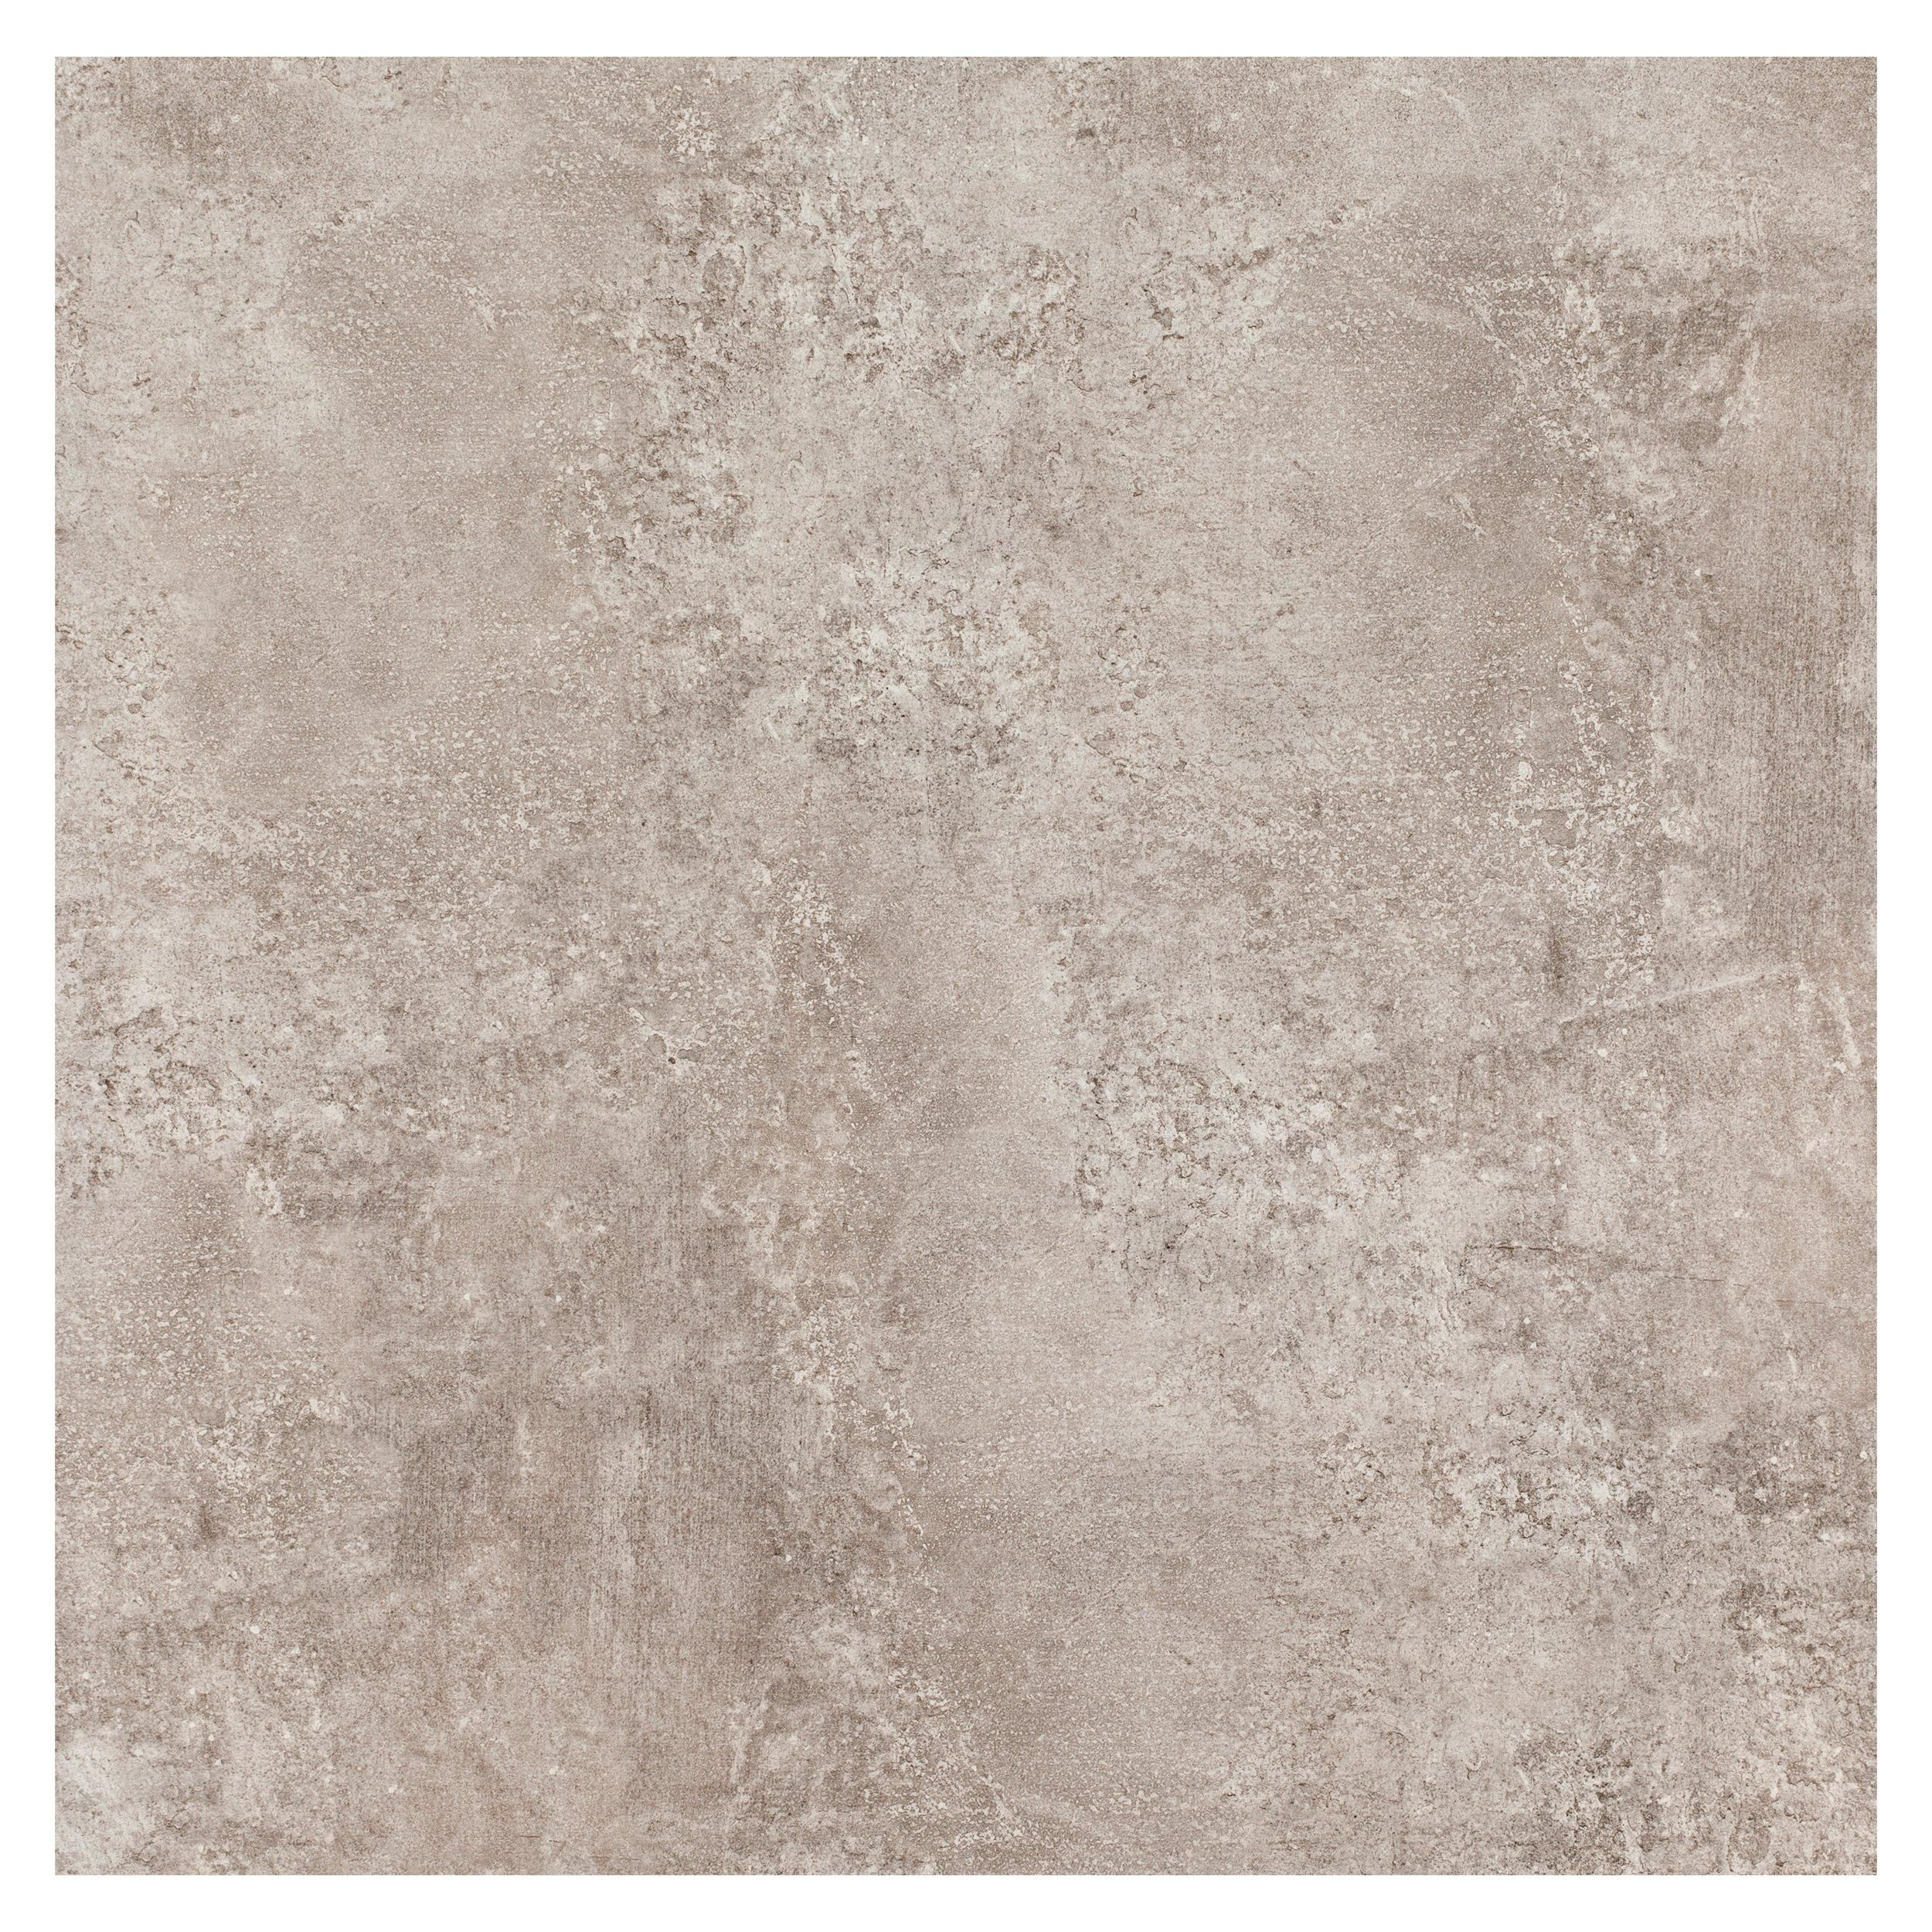 Cronos Gray Matte Porcelain Tile In 2020 Porcelain Tile Tiles Floor